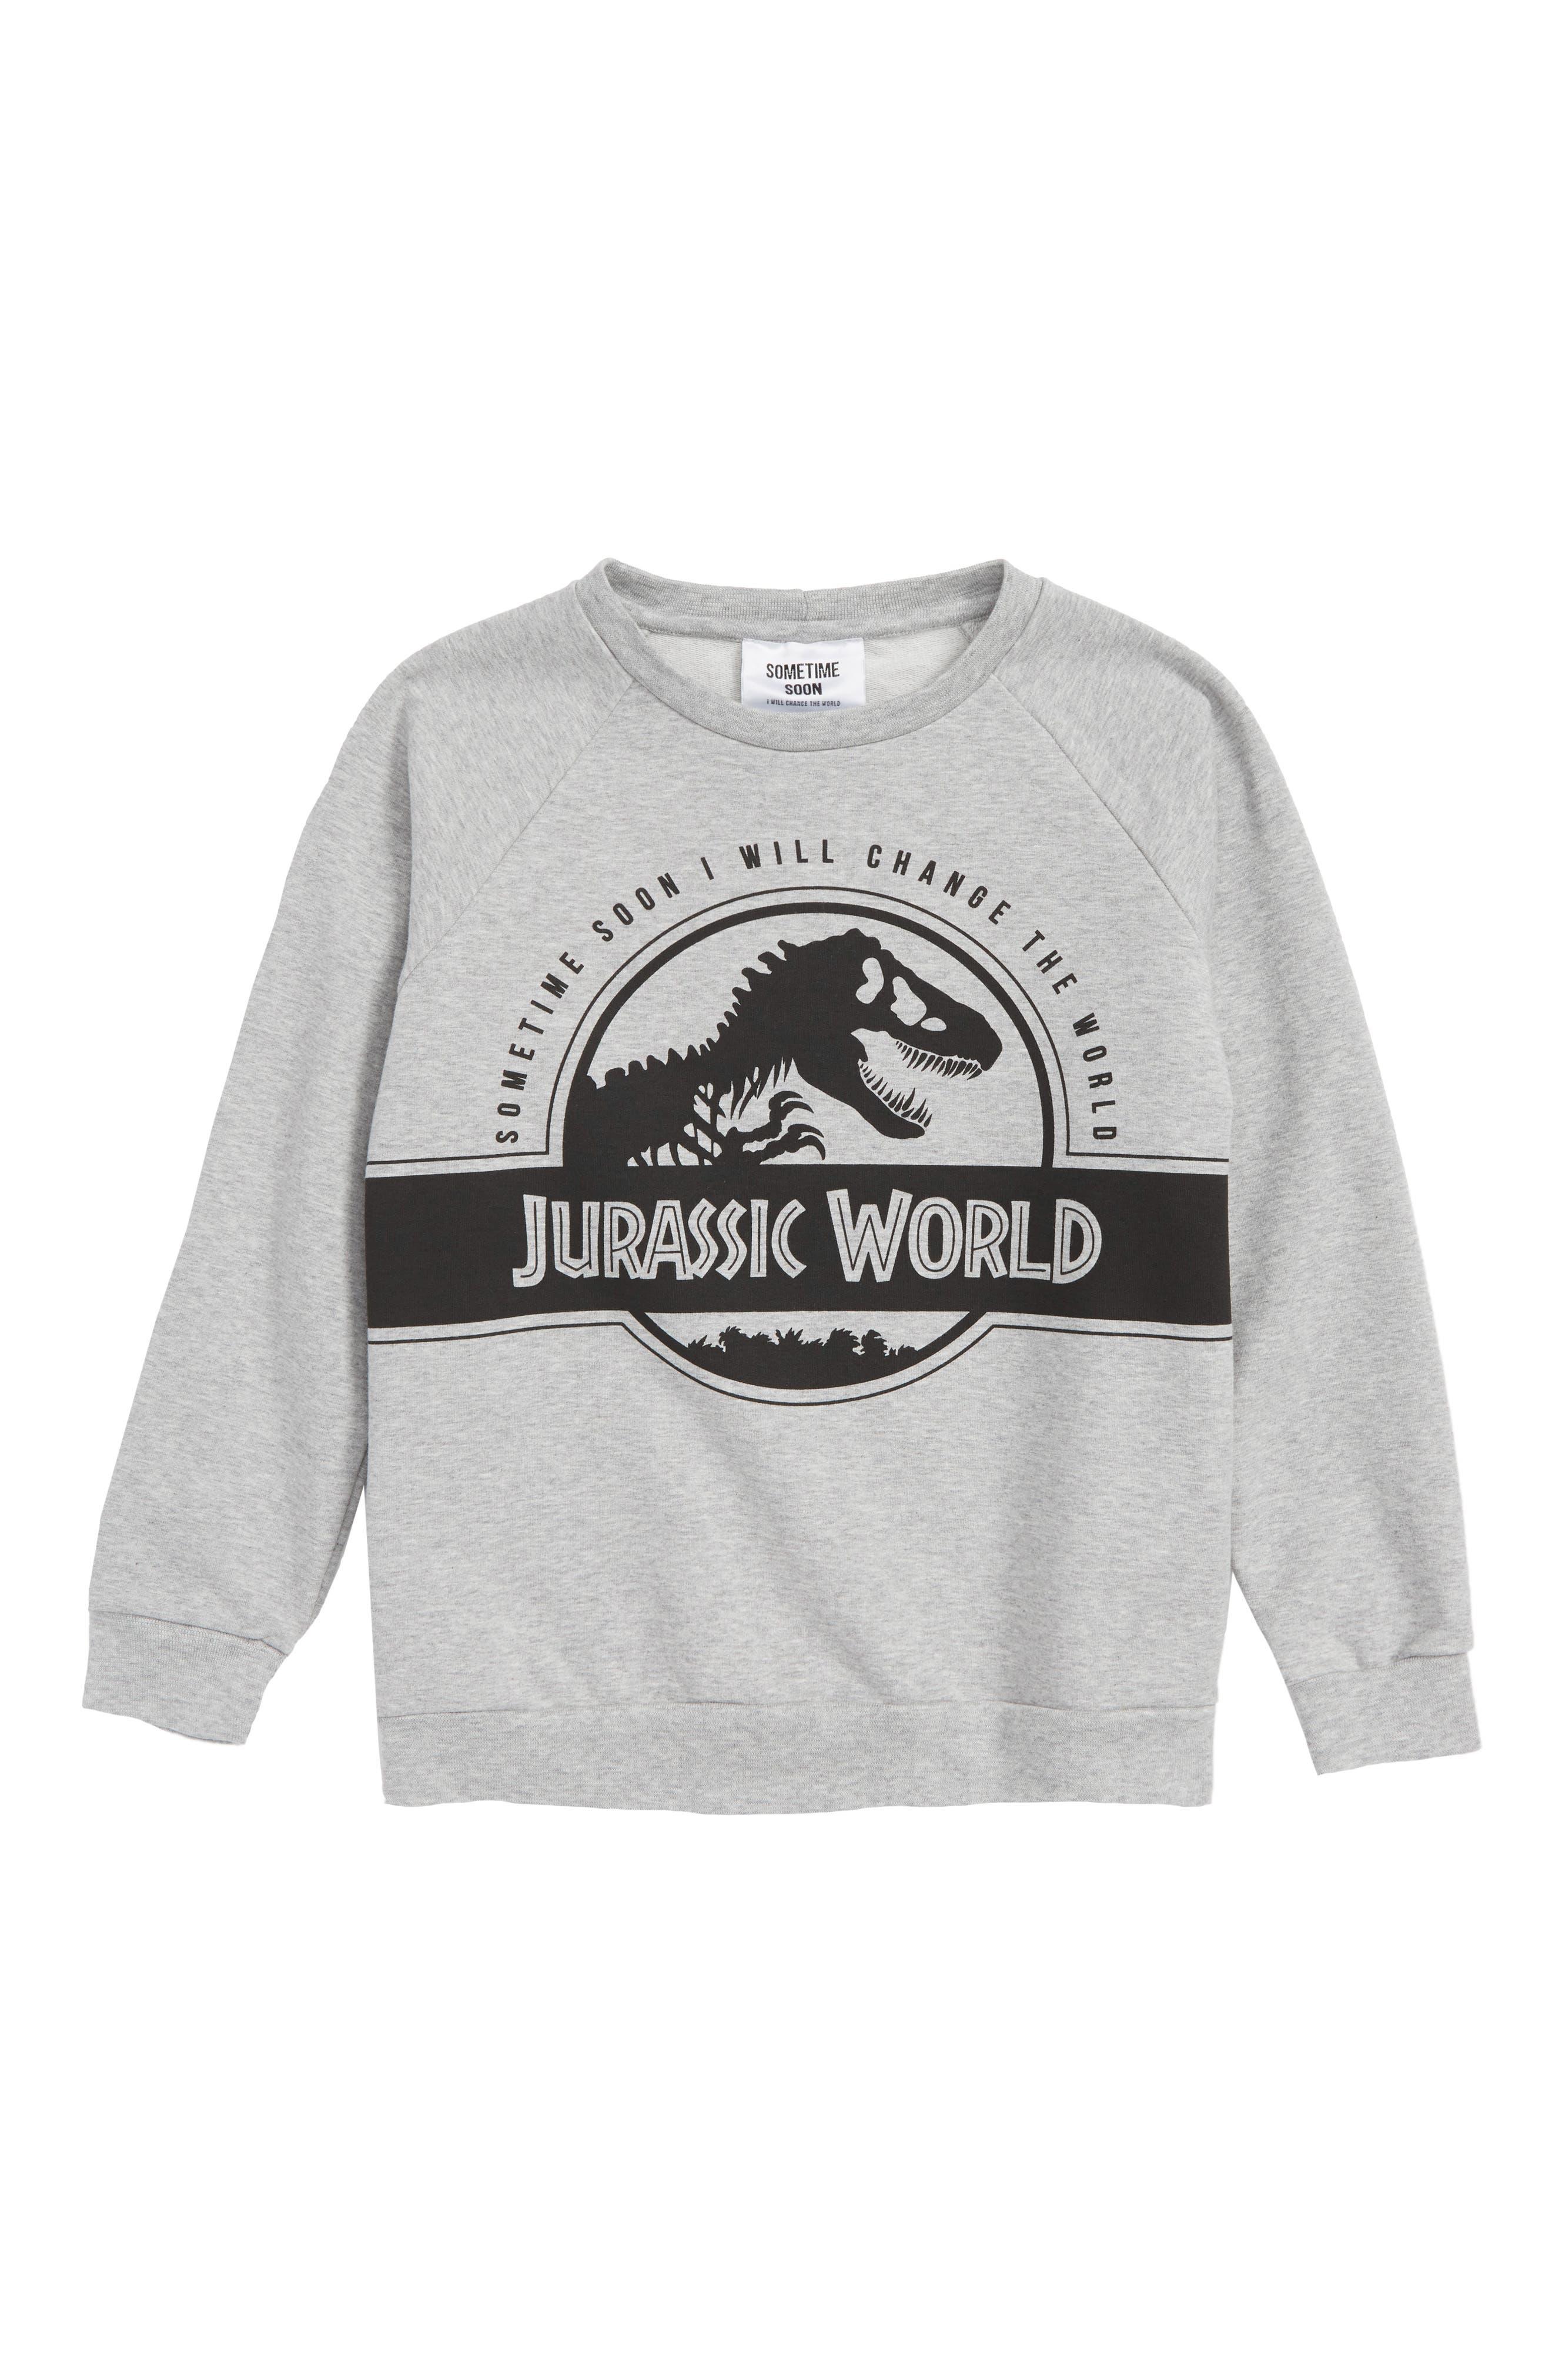 x Jurassic World Rex Graphic Organic Cotton Sweatshirt,                             Main thumbnail 1, color,                             Grey Melange